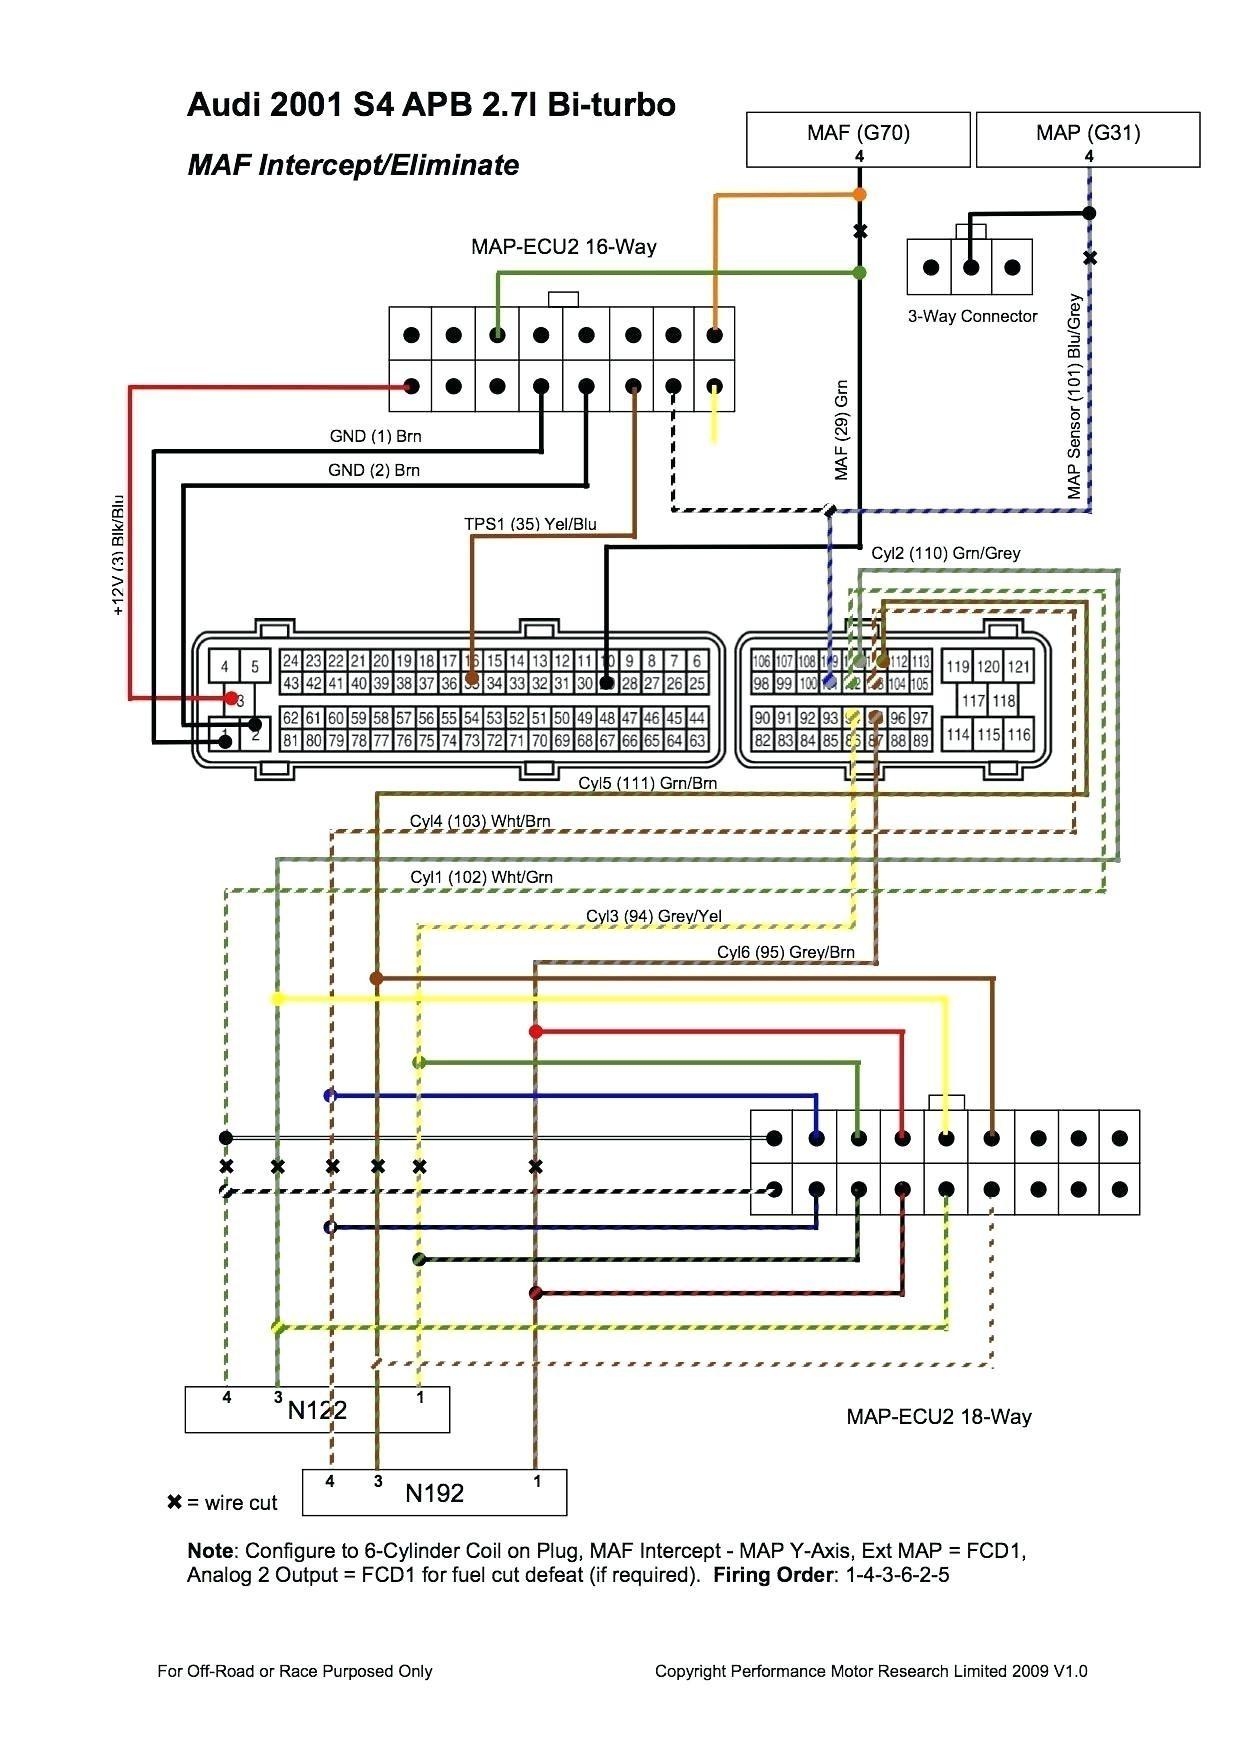 Fuse Box In Daihatsu Terios - Wiring Schematics Daihatsu Sirion Fuse Box Location on